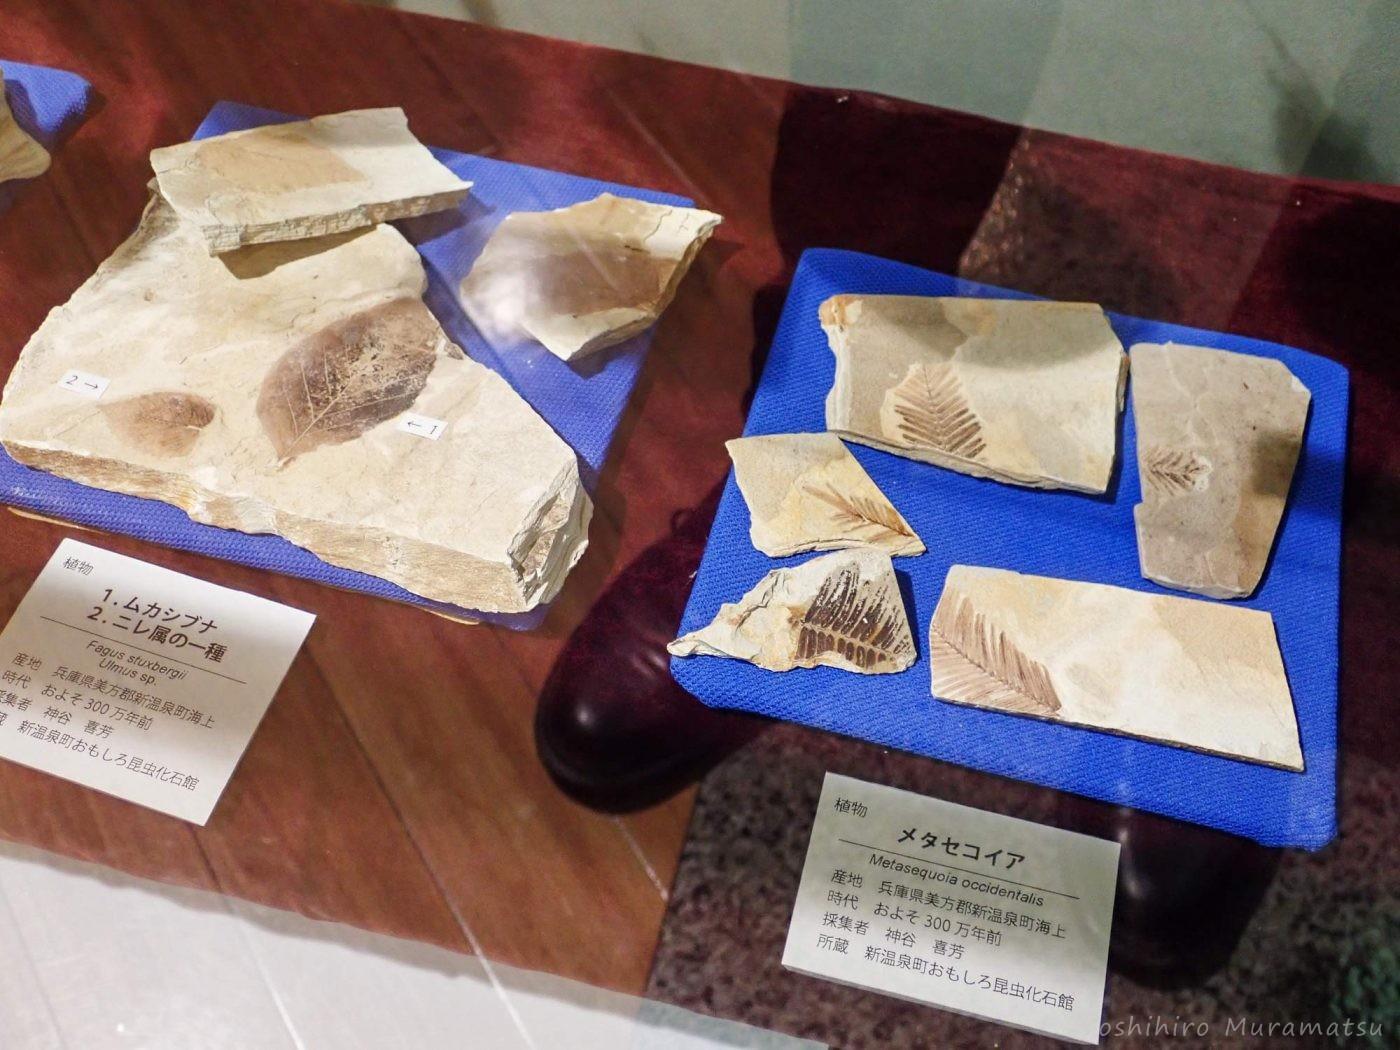 昆虫化石 植物化石の写真